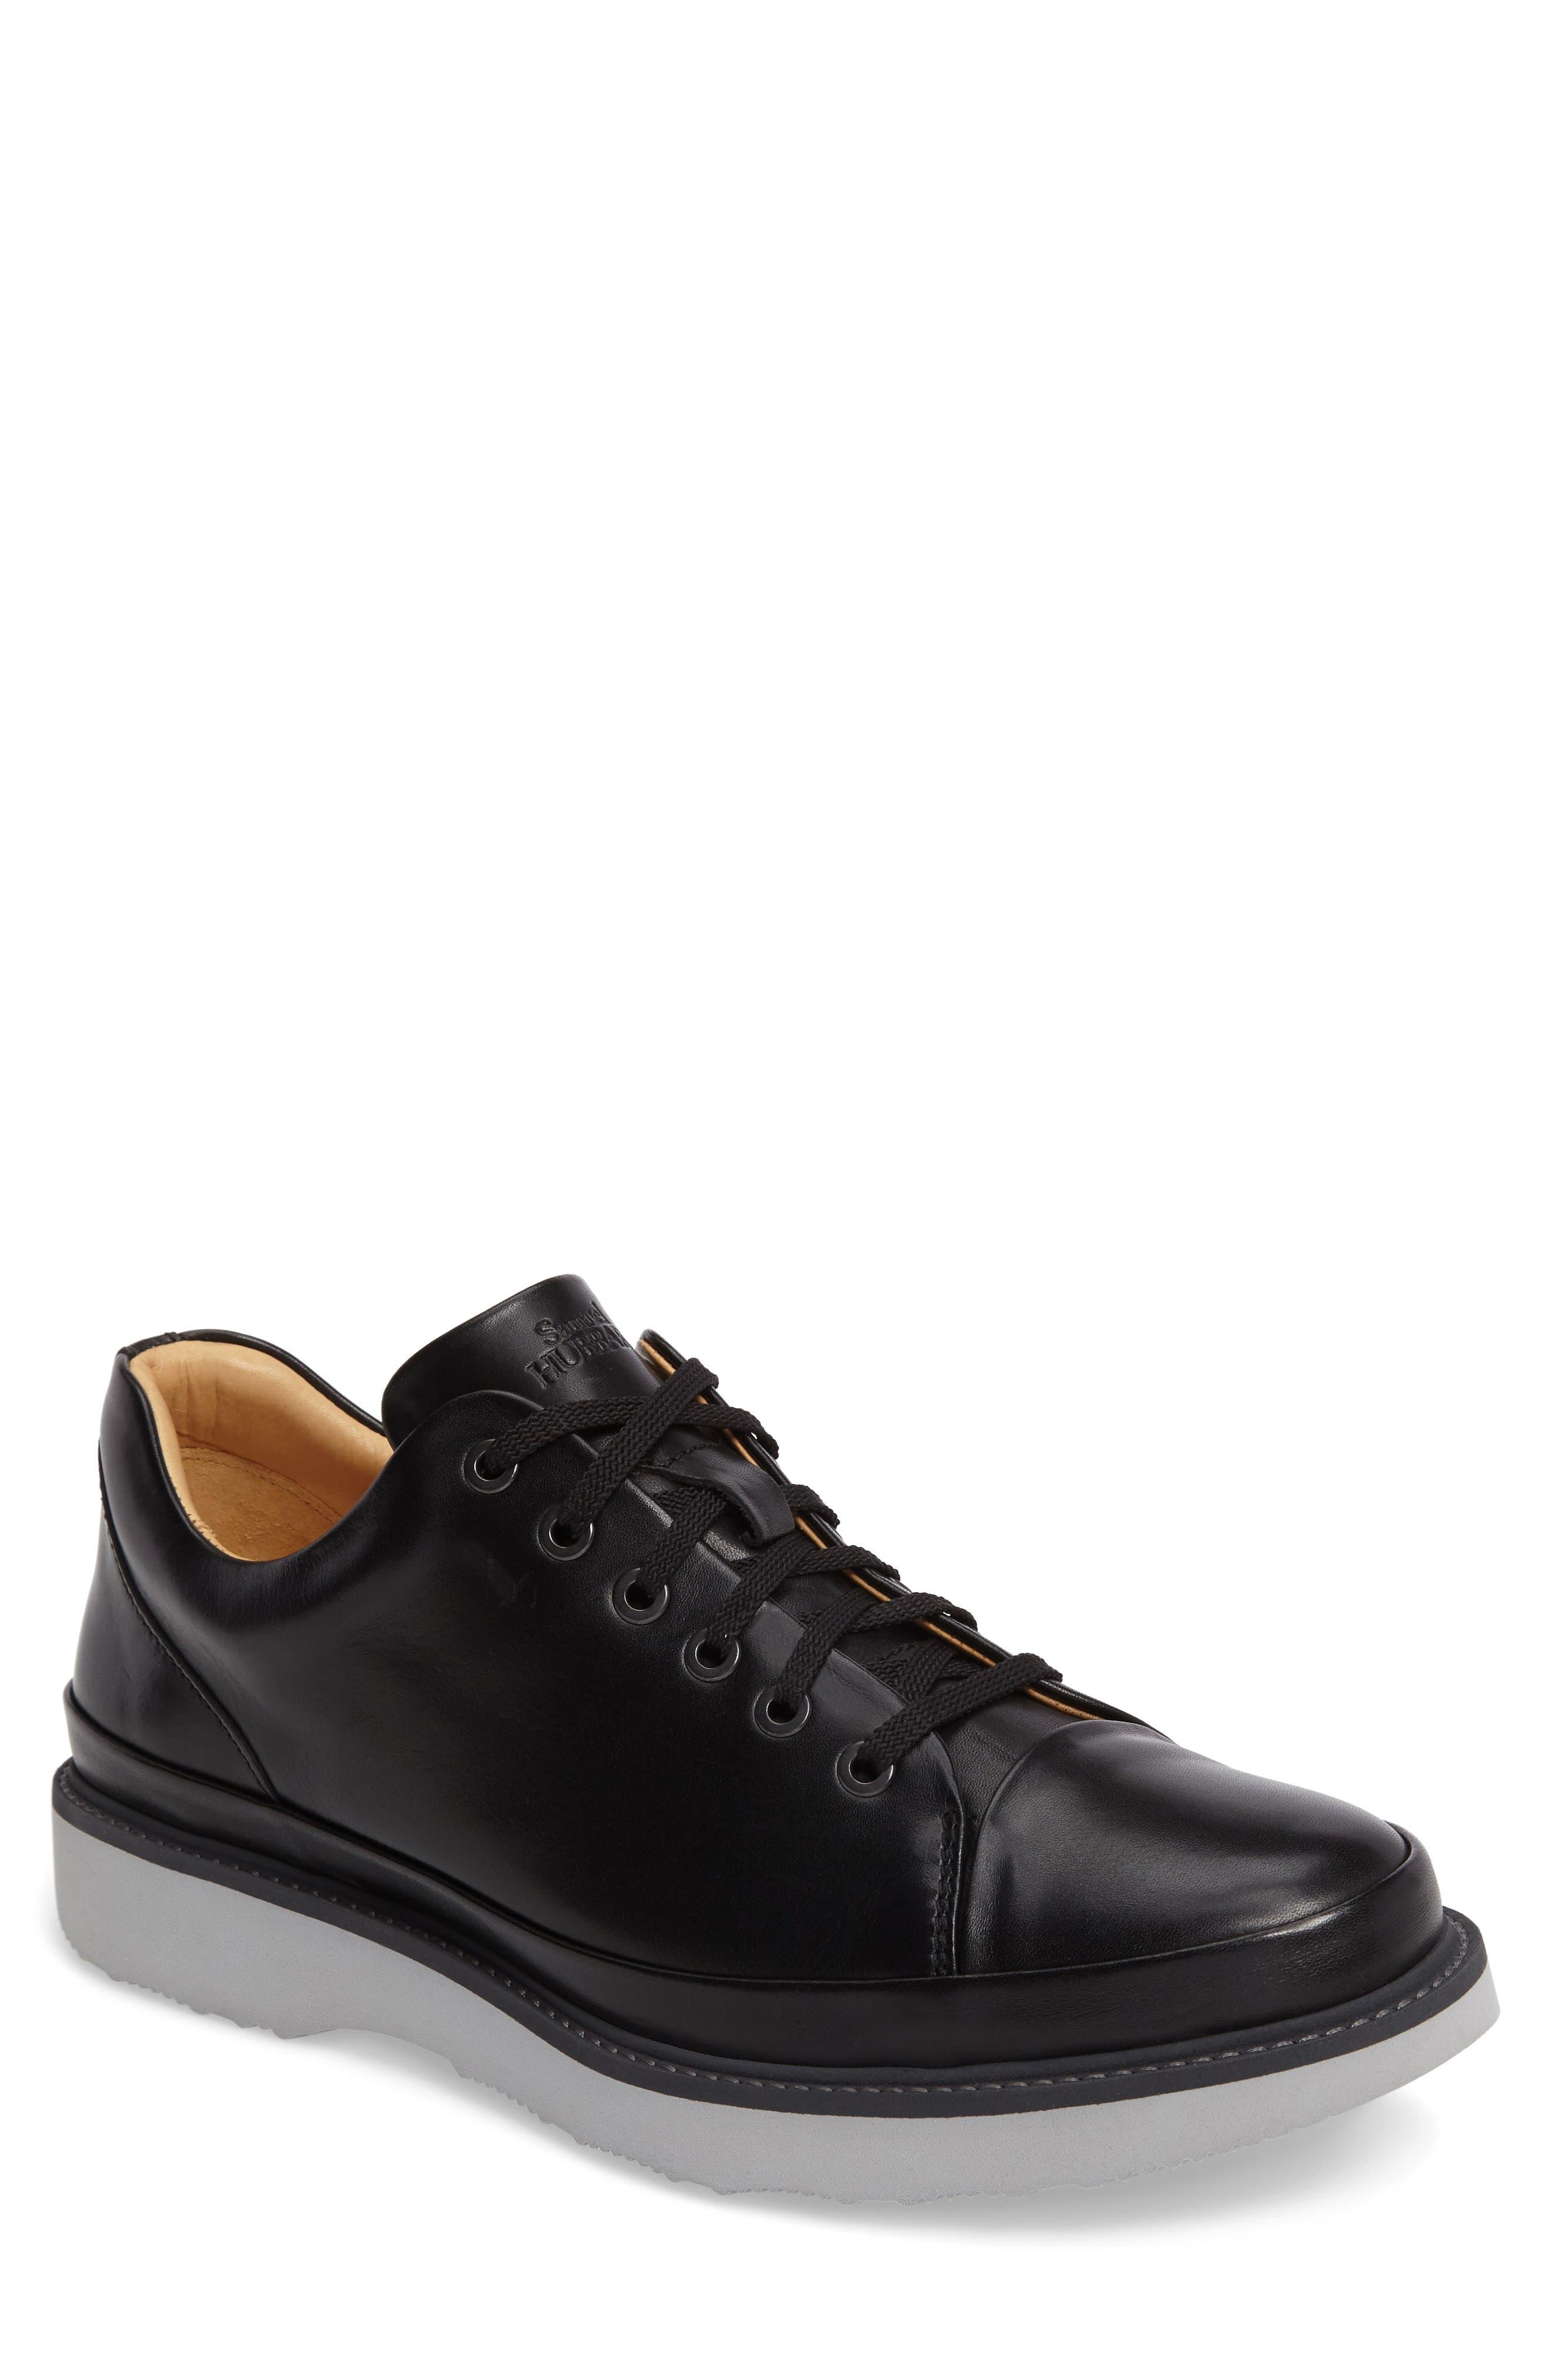 SAMUEL HUBBARD Sneaker, Main, color, BLACK LEATHER